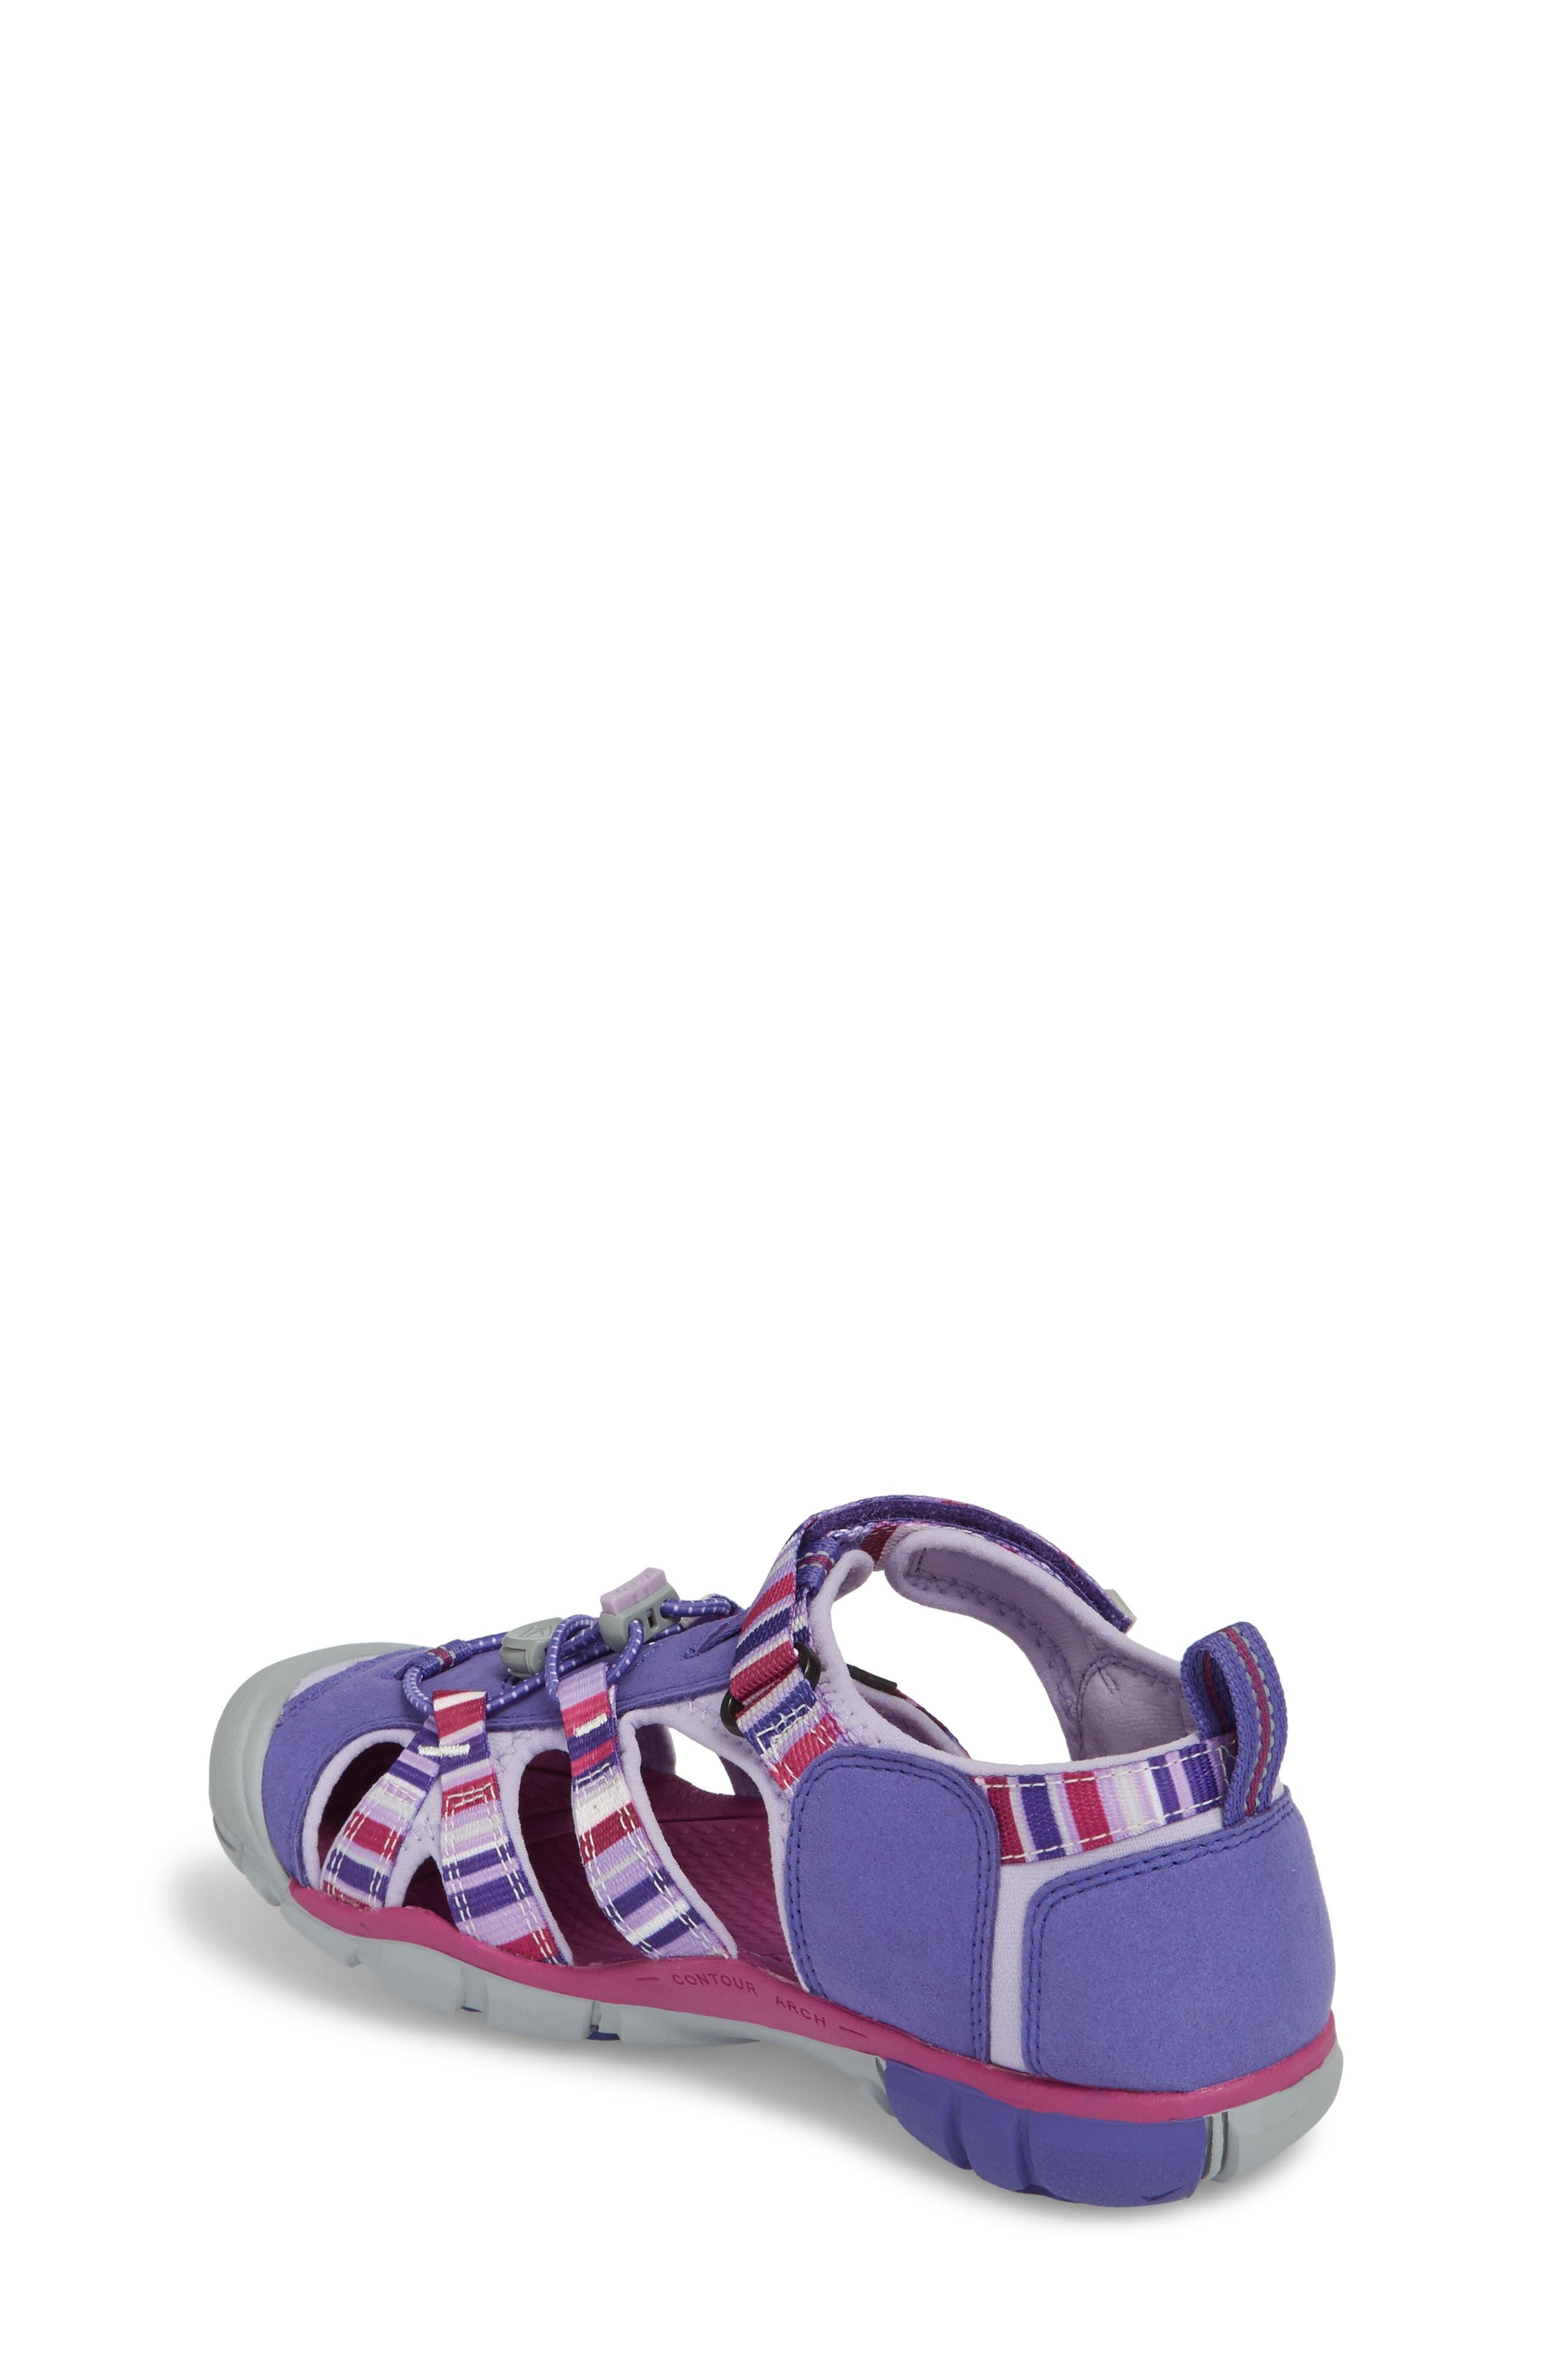 ,                             'Seacamp II' Water Friendly Sandal,                             Alternate thumbnail 66, color,                             510